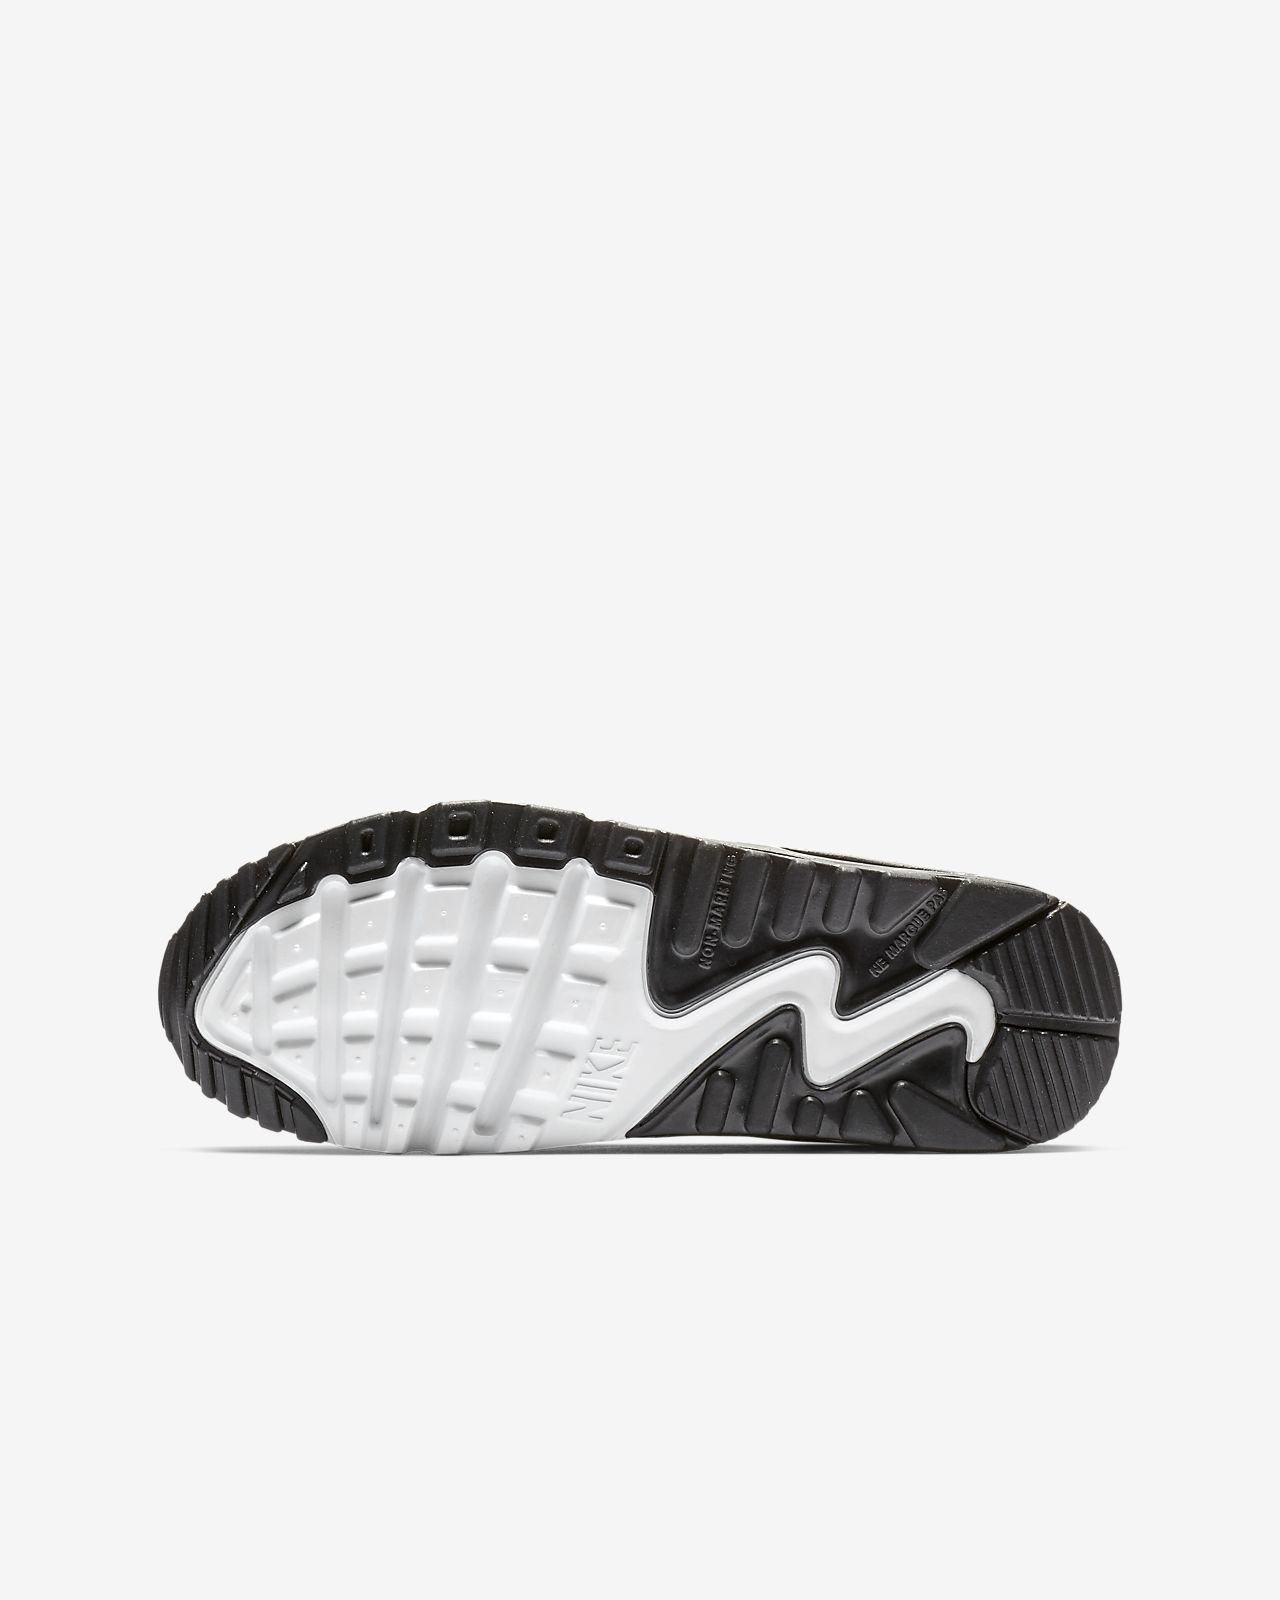 premium selection c38c1 8bda1 ... Nike Air Max 90 Leather Schuh für ältere Kinder